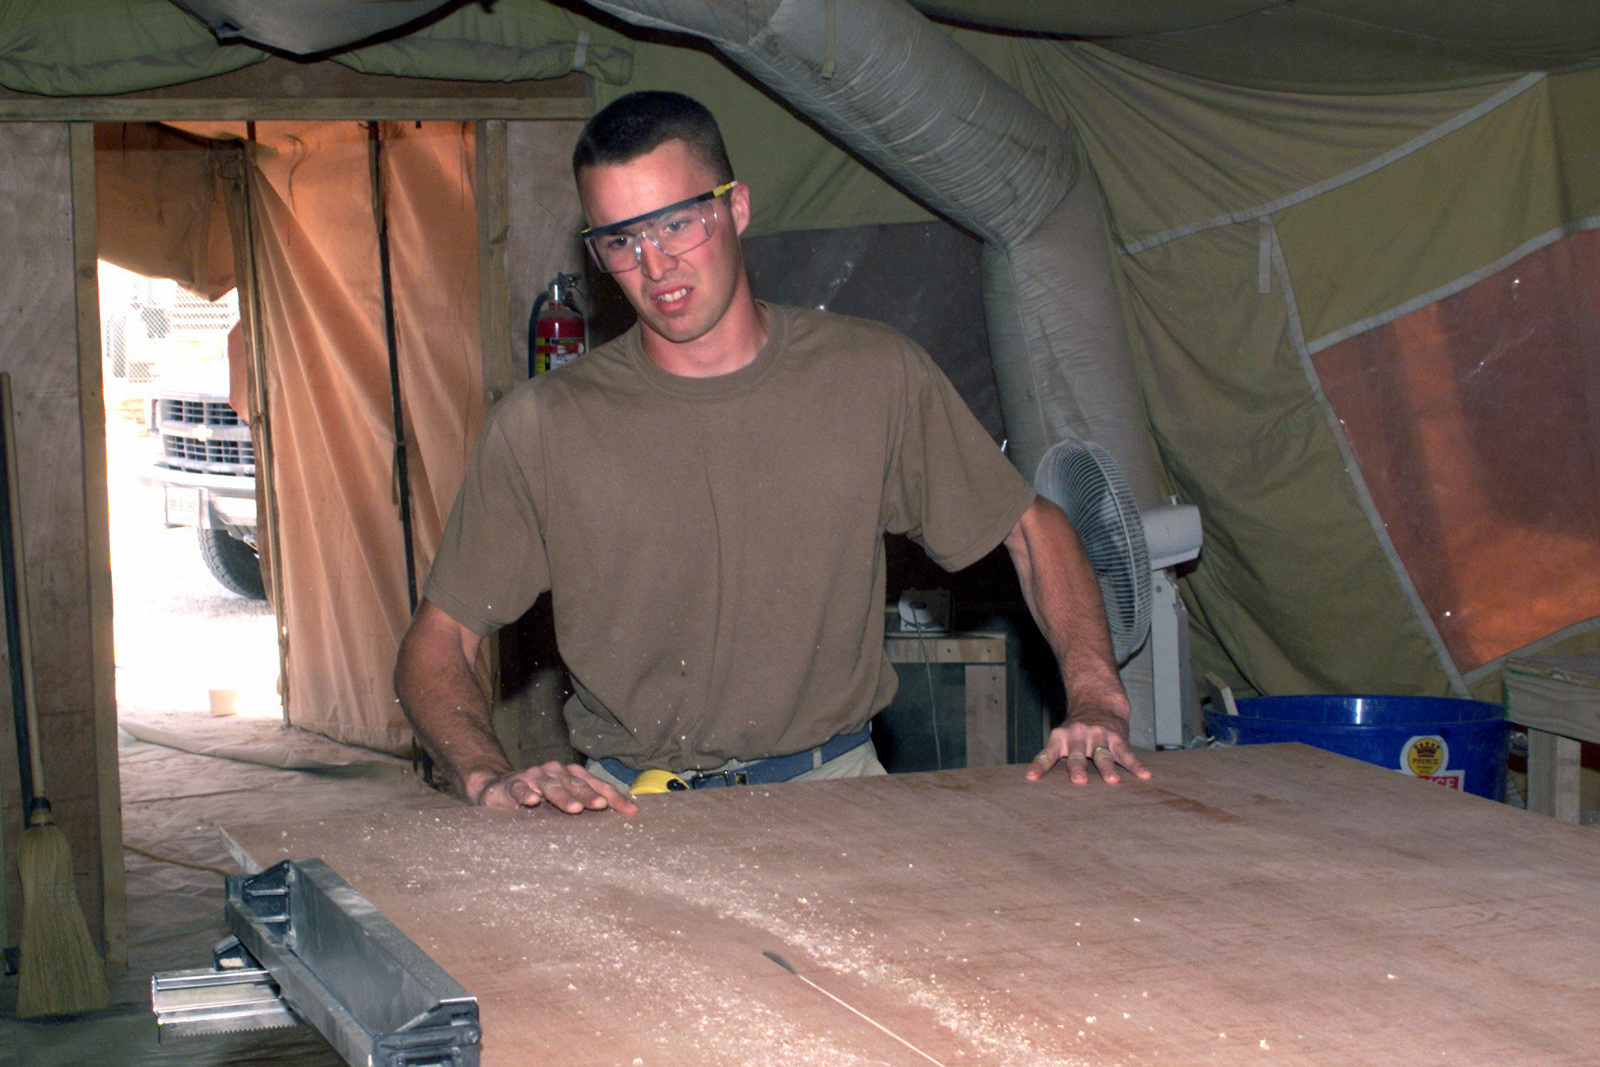 Inside a TEMPER (Tent, Extendable, Modular, Personnel) tent